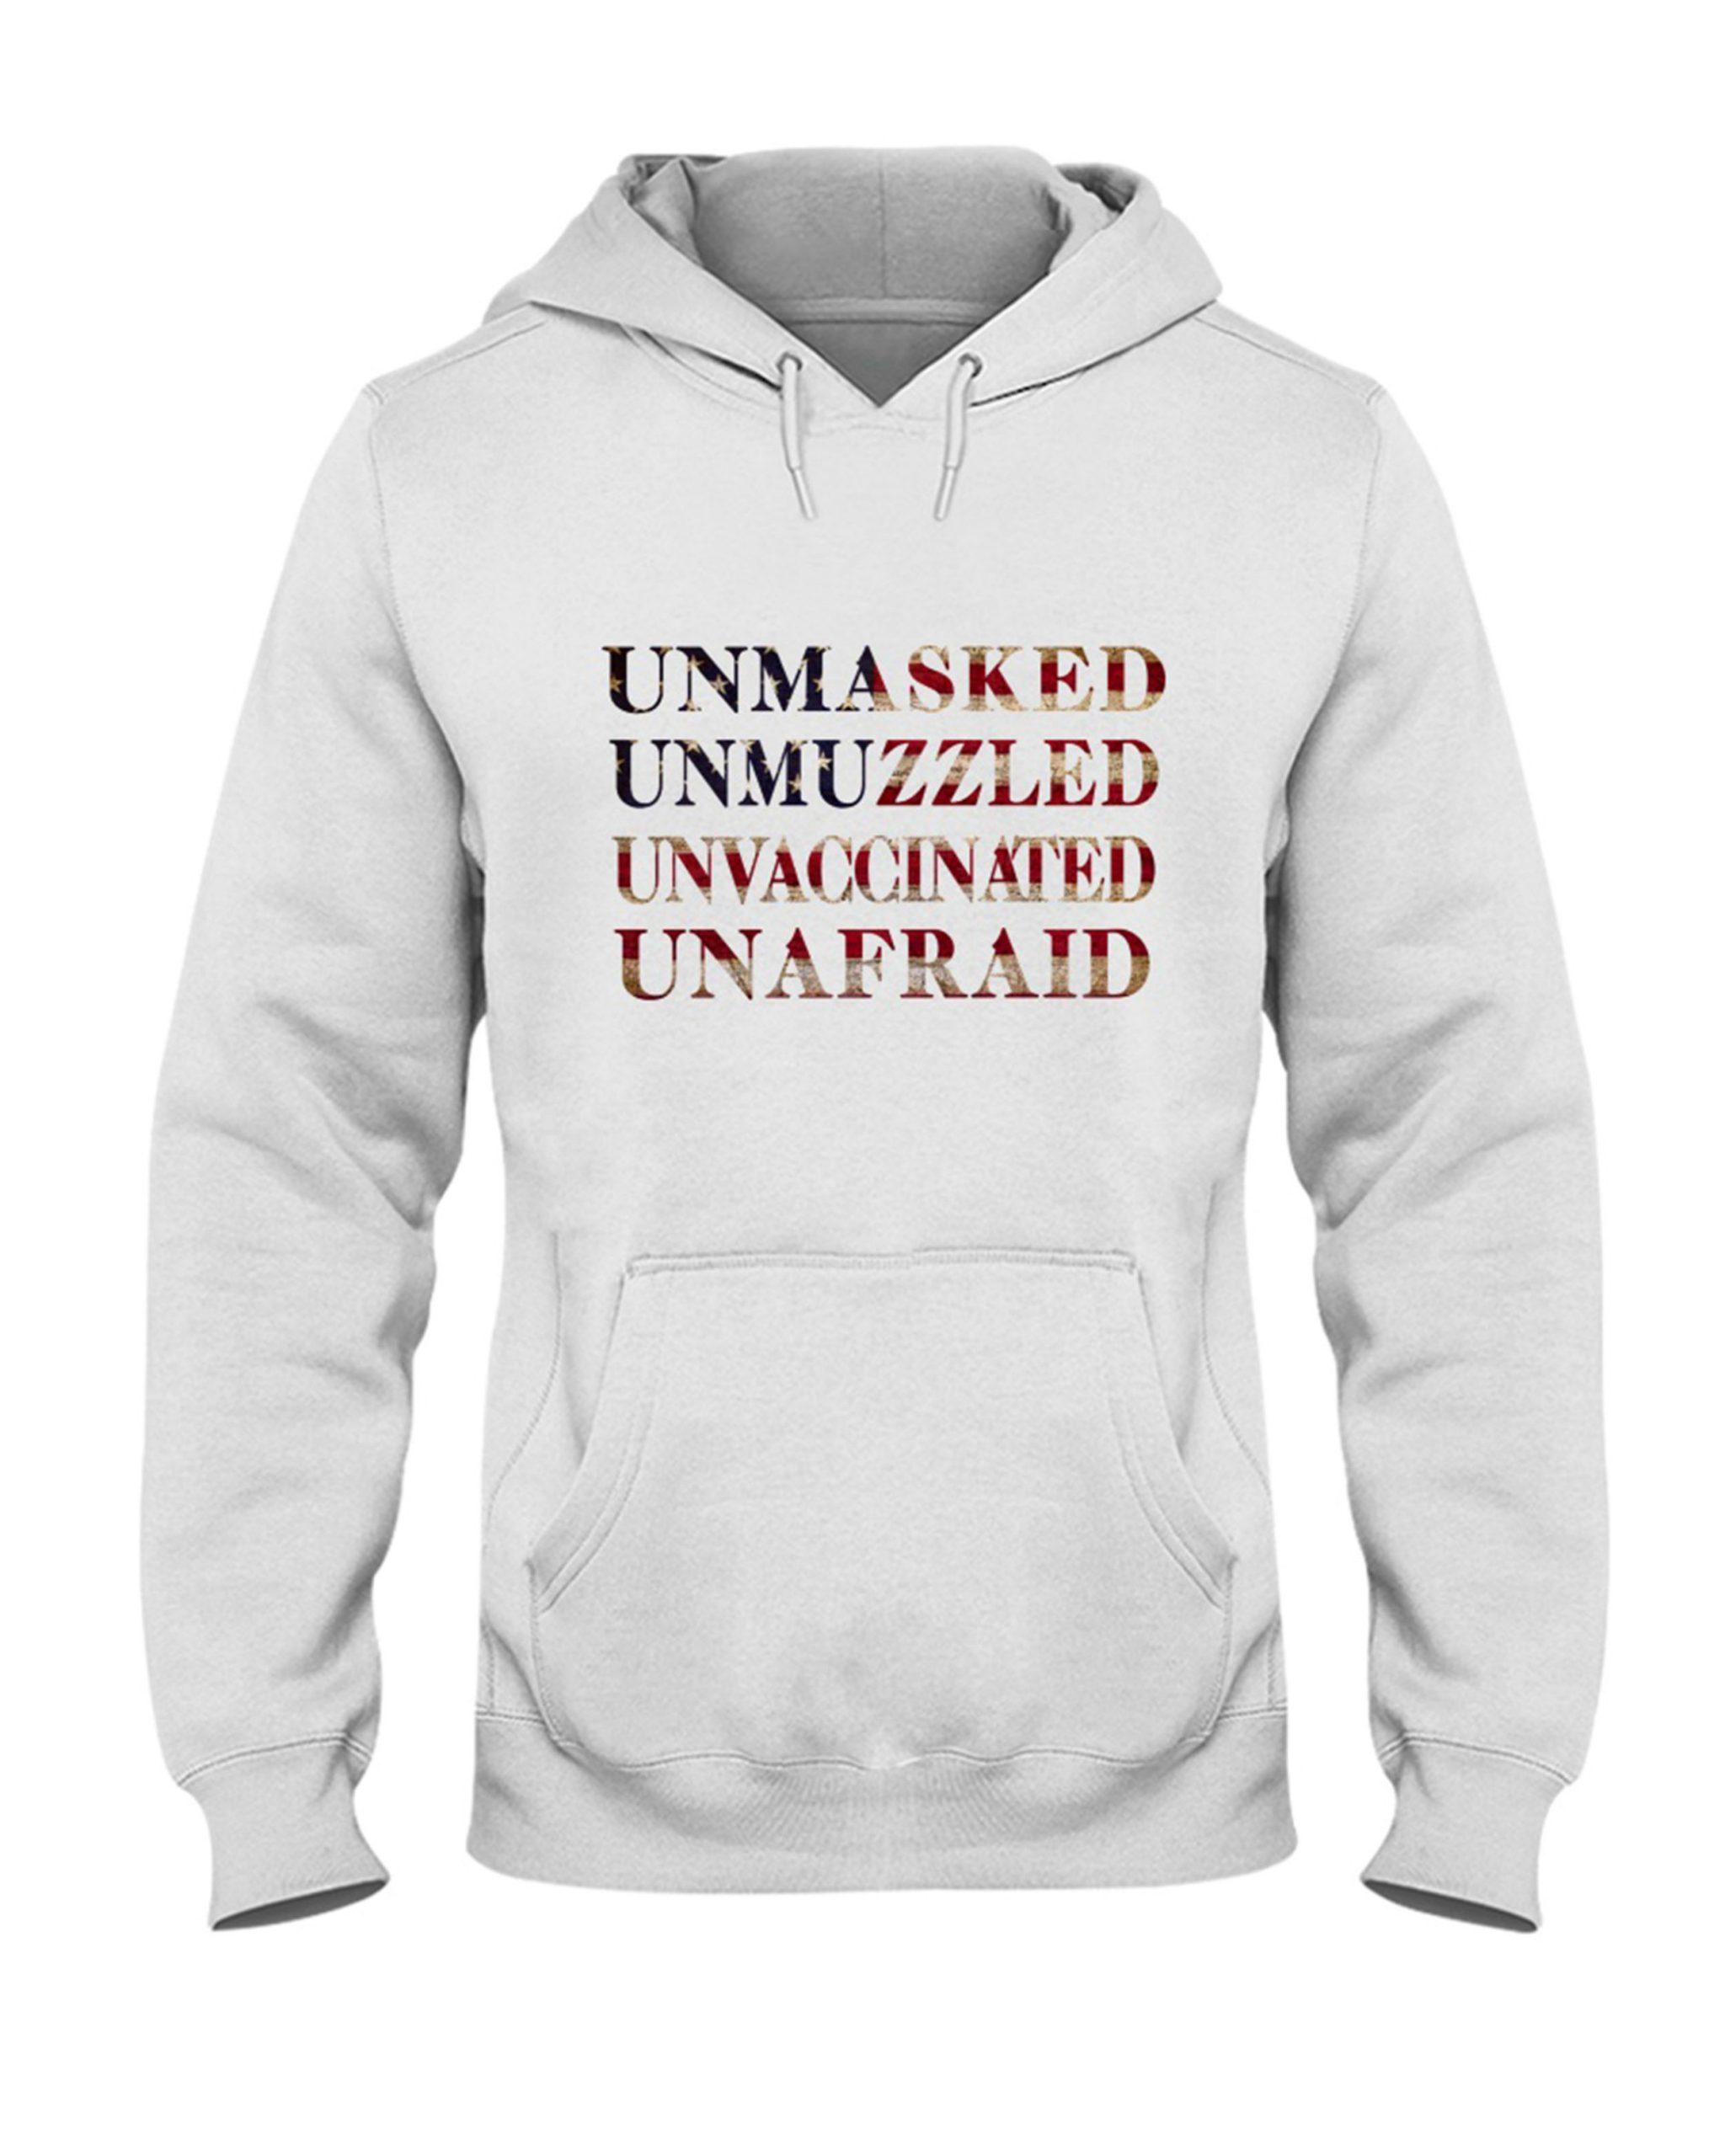 Unmasked Unmuzzled Unvaccinated Unafraid Shirt 2